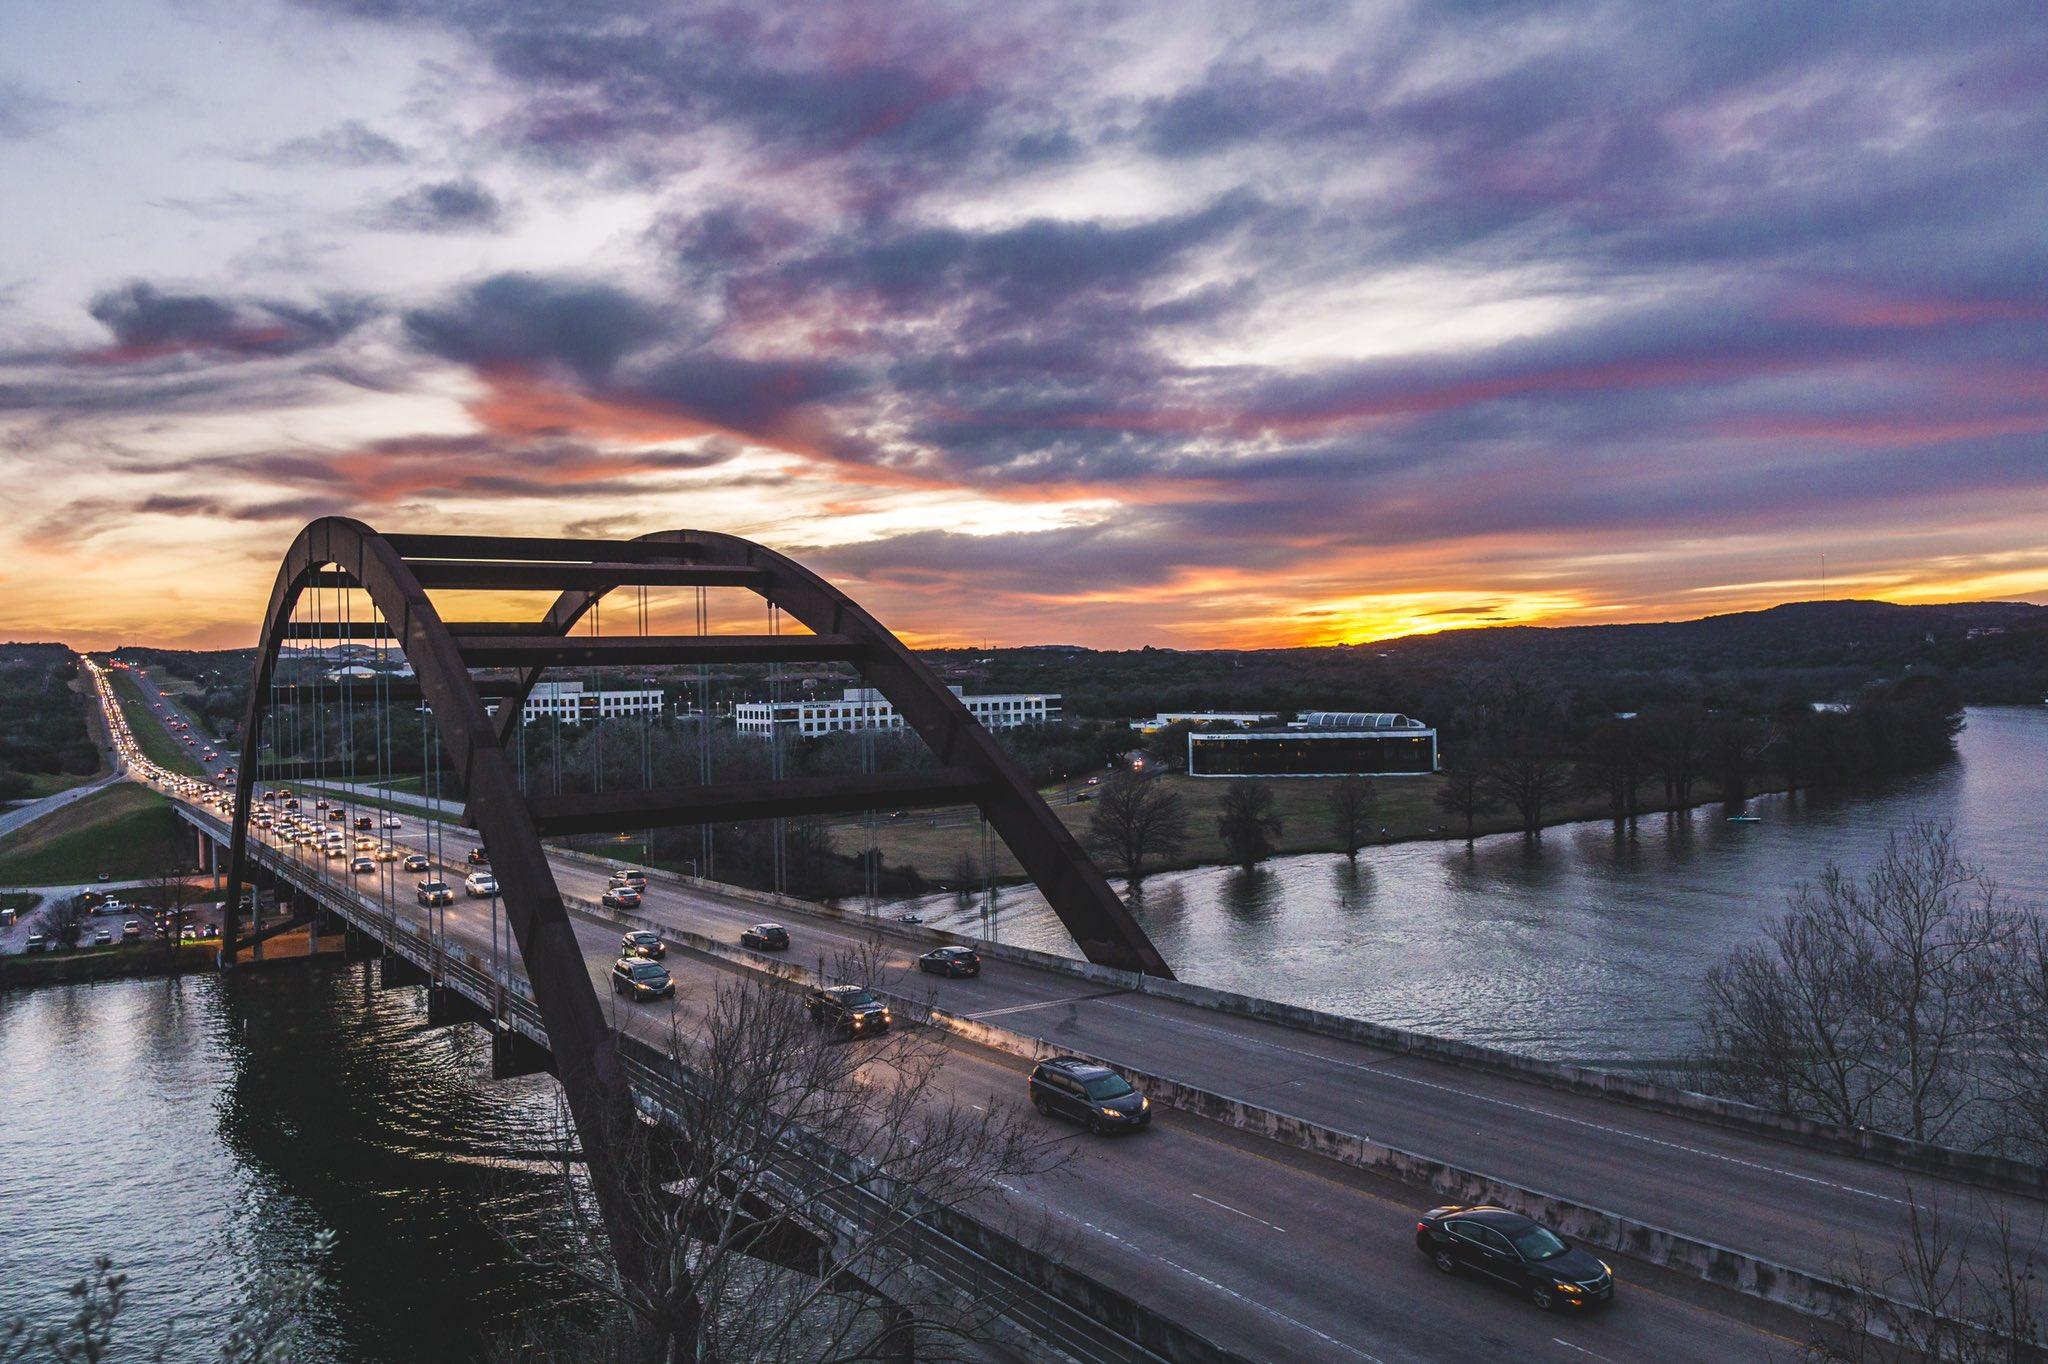 Sunset at Pennybacker bridge... @TexasHighways @TexasMonthly #sunsets #austin #Texas @KVUE https://t.co/9VYfKuz44z